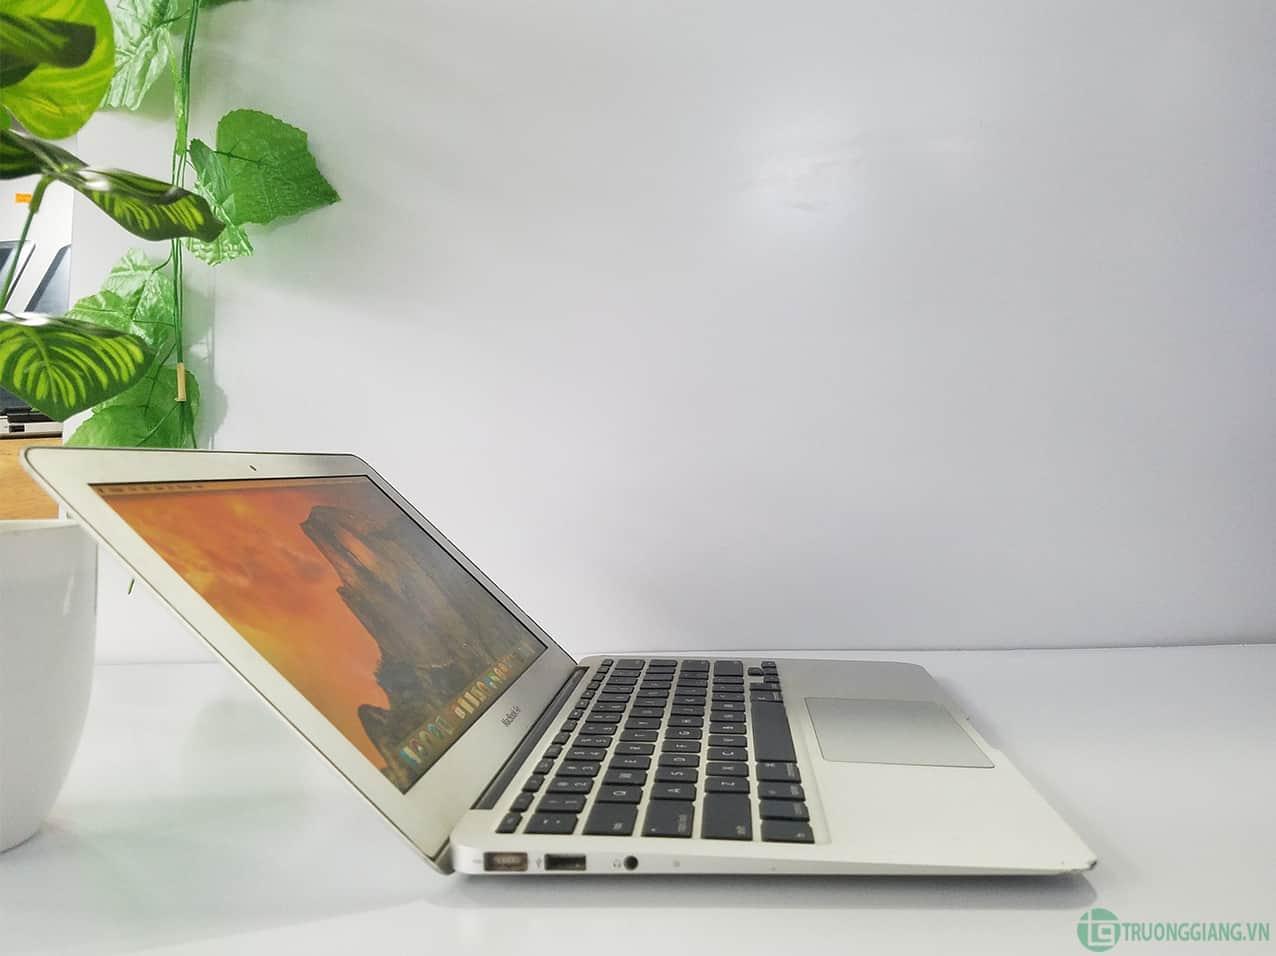 Kiểu dángMacbook Air Mid 2011